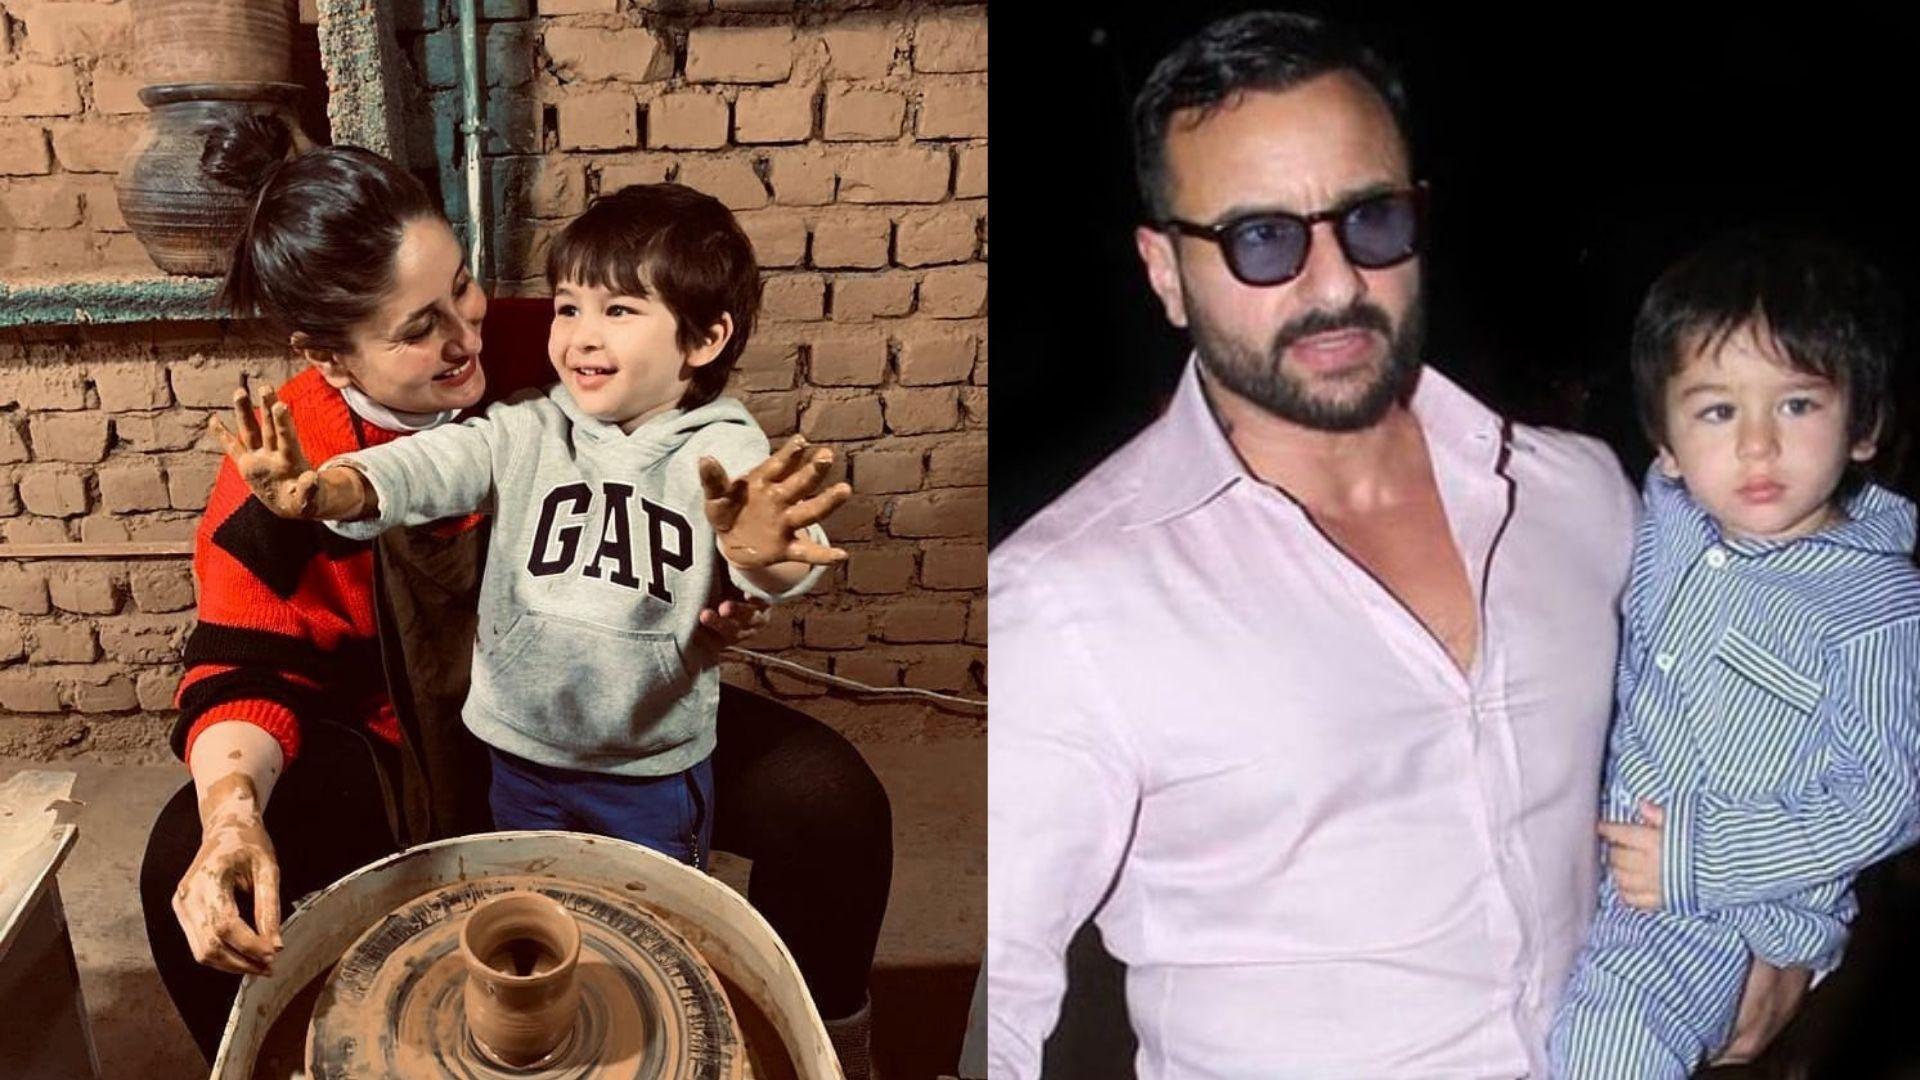 After Kareena Kapoor Khan Said No Bollywood For Tim And Jeh, Papa Saif Ali Khan Shares An Acting Advice For Them To Make It 'Entertaining'